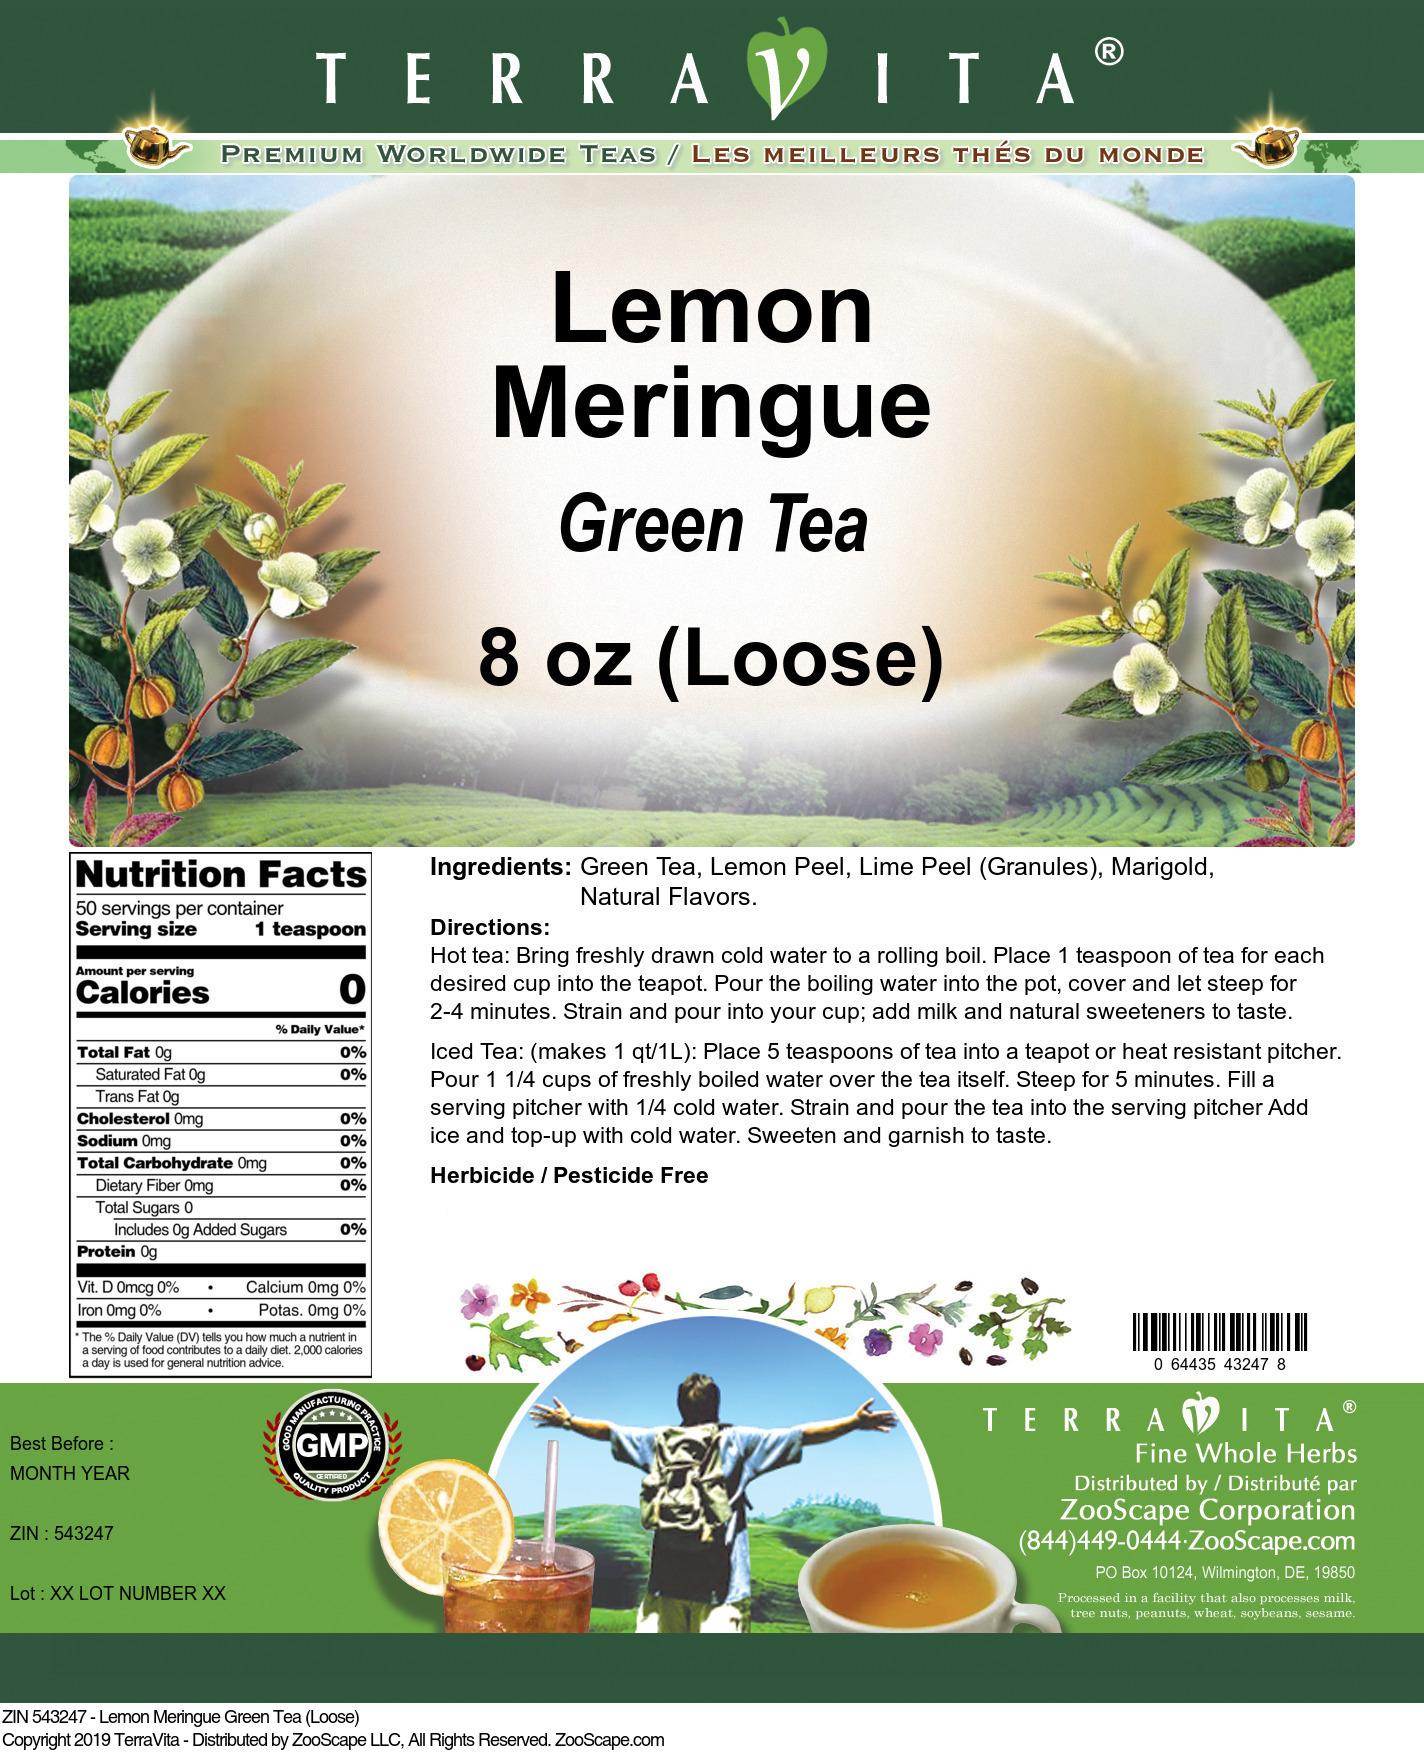 Lemon Meringue Green Tea (Loose)